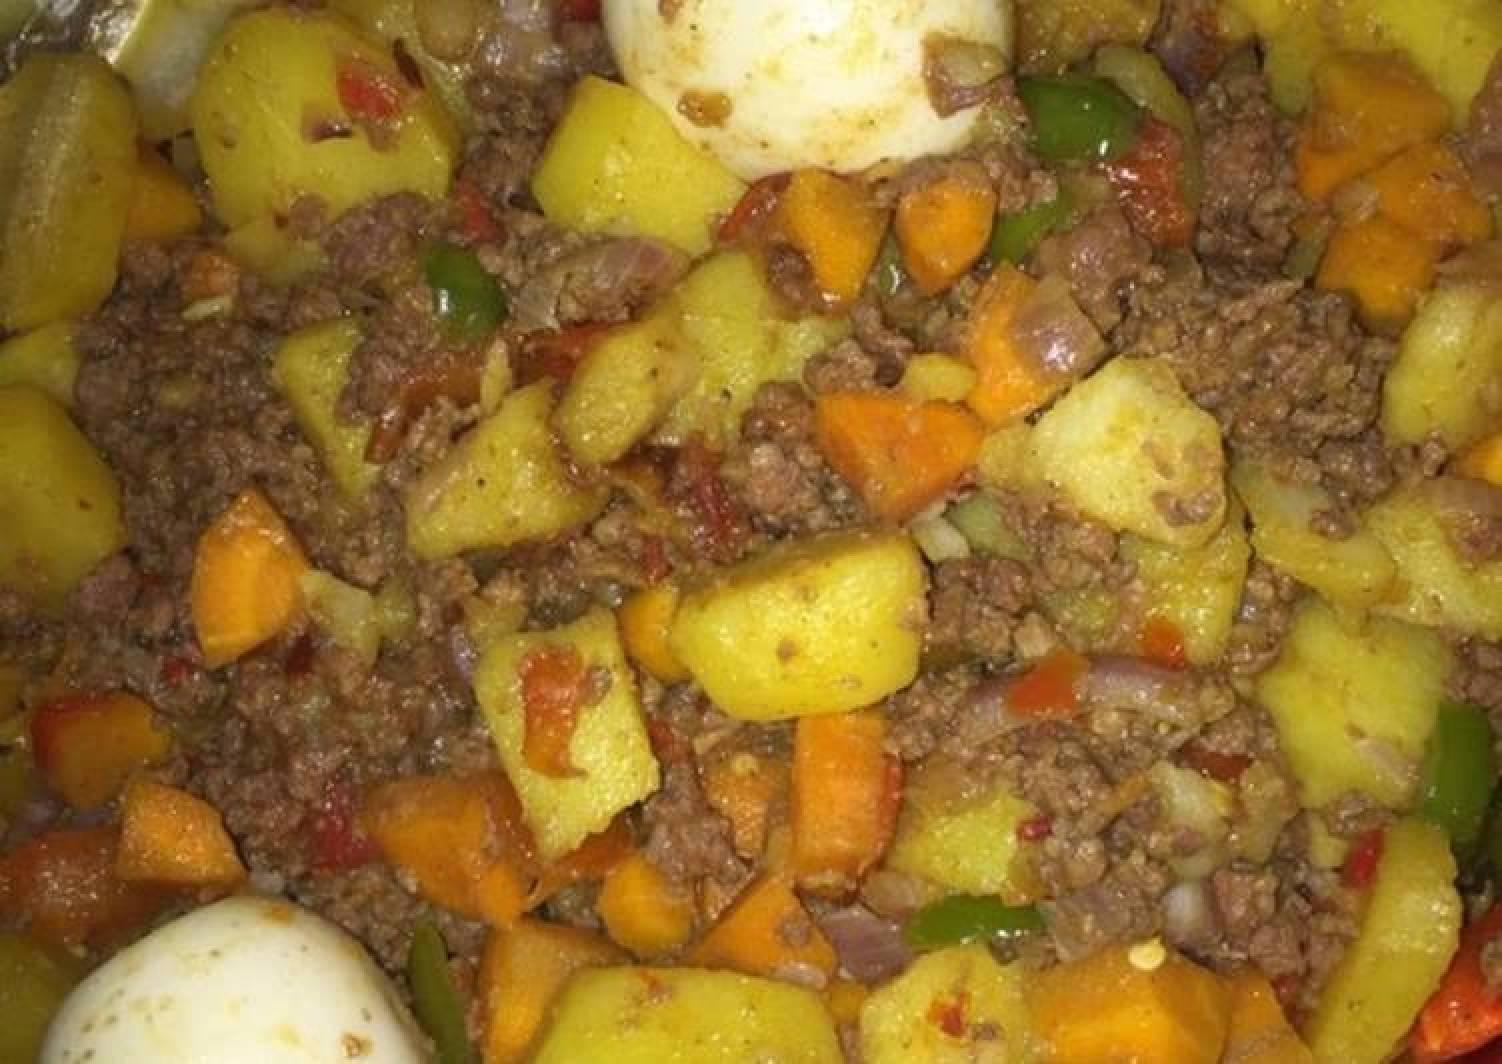 Potato casserole